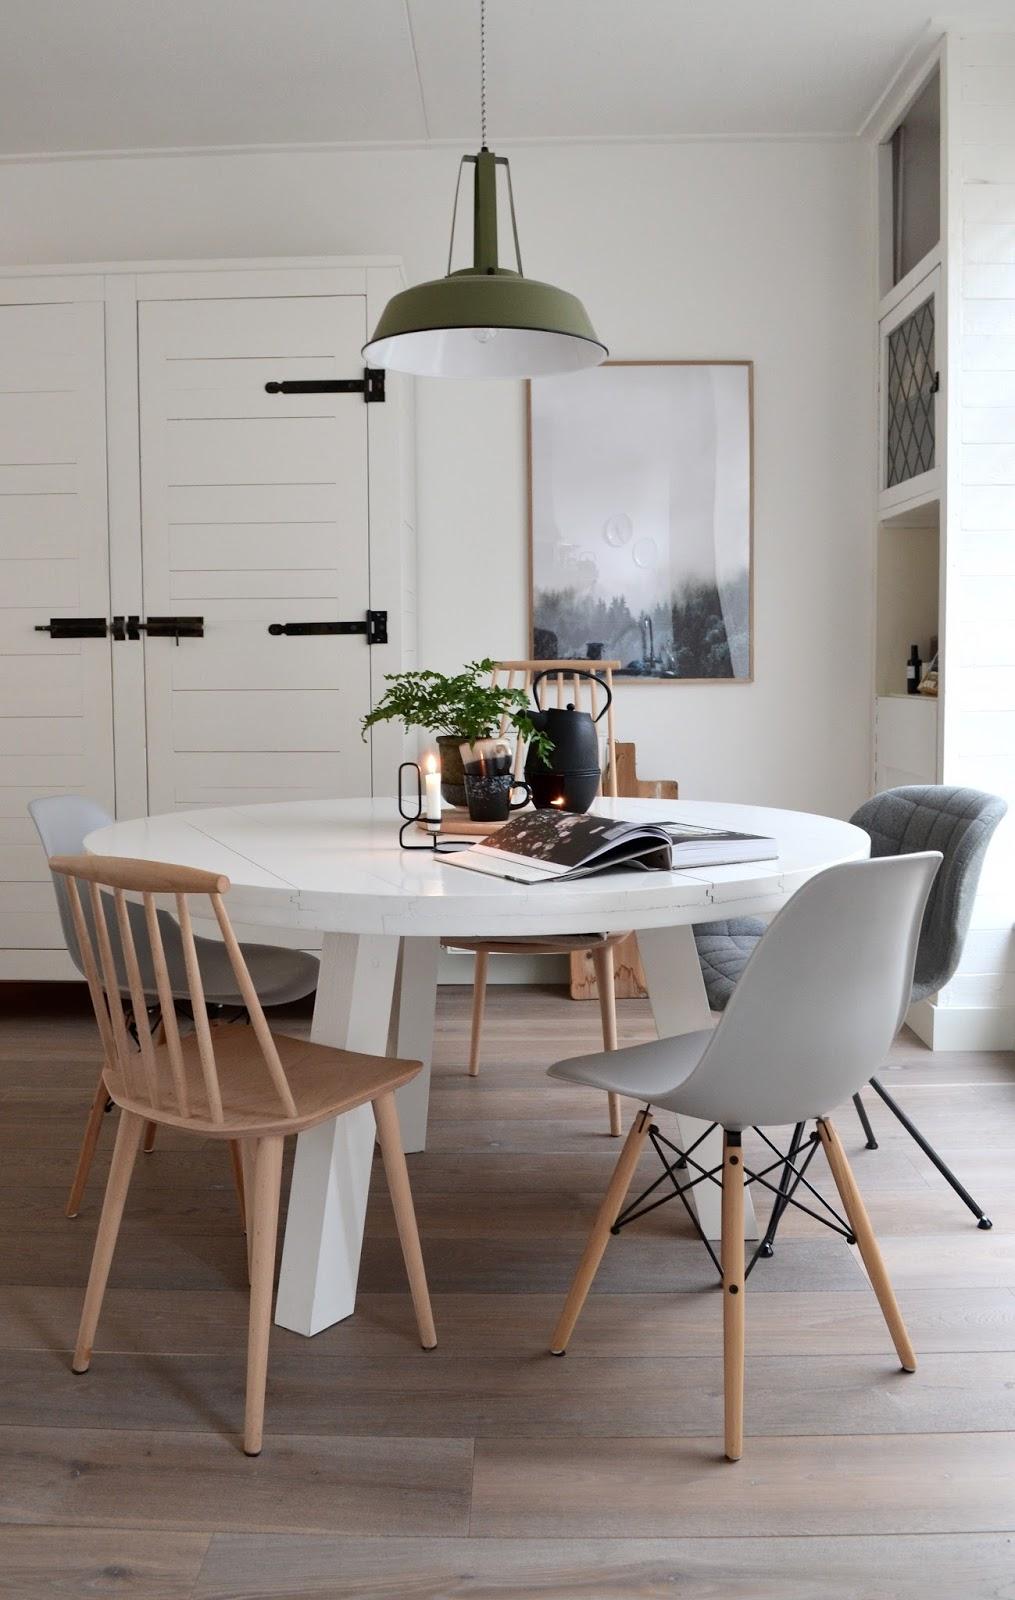 Dime qu mesa redonda tienes y te dir qu mix de sillas elegir - Mesa de cocina redonda ...